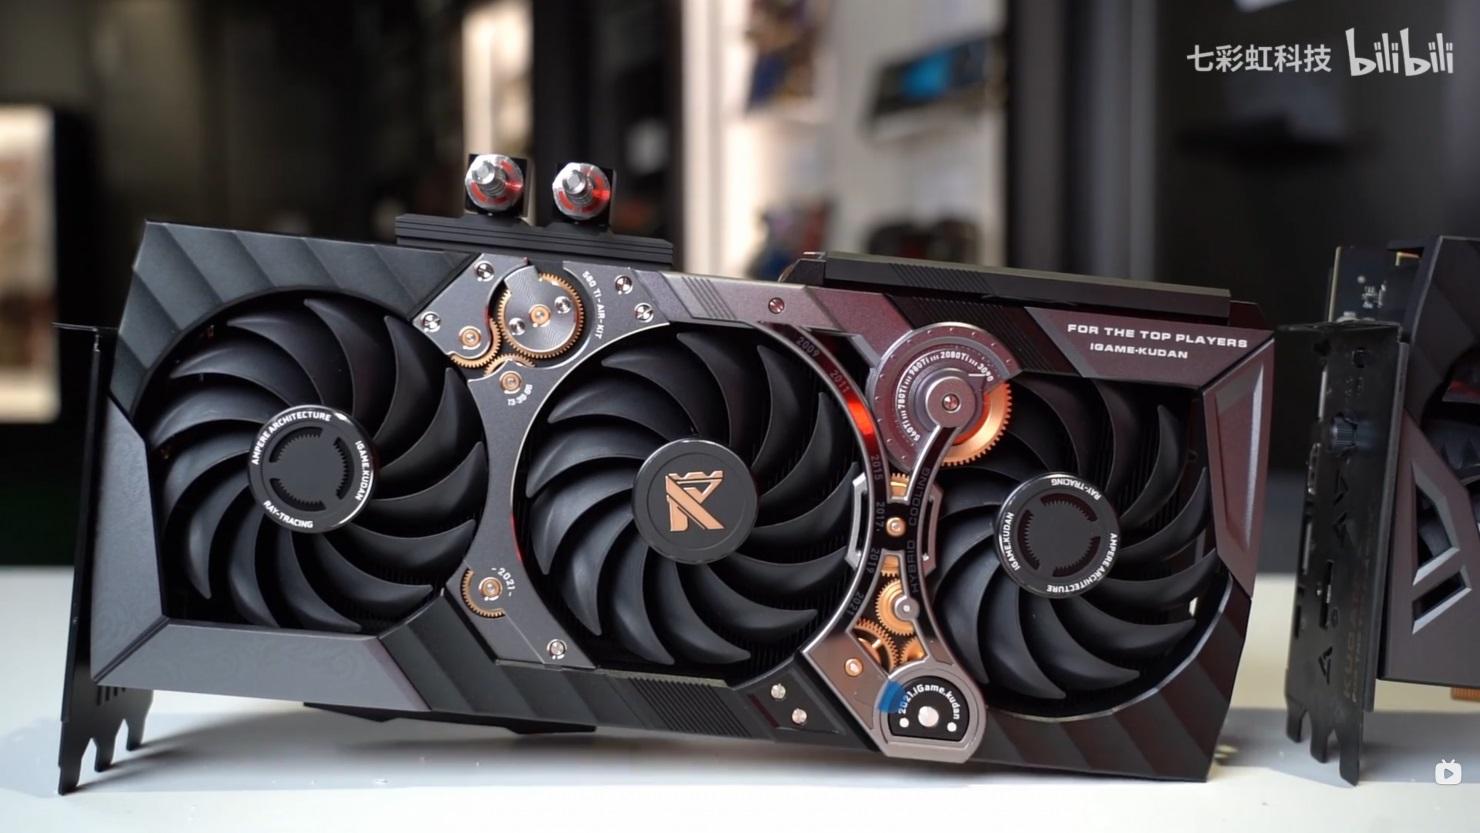 Colorful оценила видеокарту iGame GeForce RTX 3090 Kudan в $4999